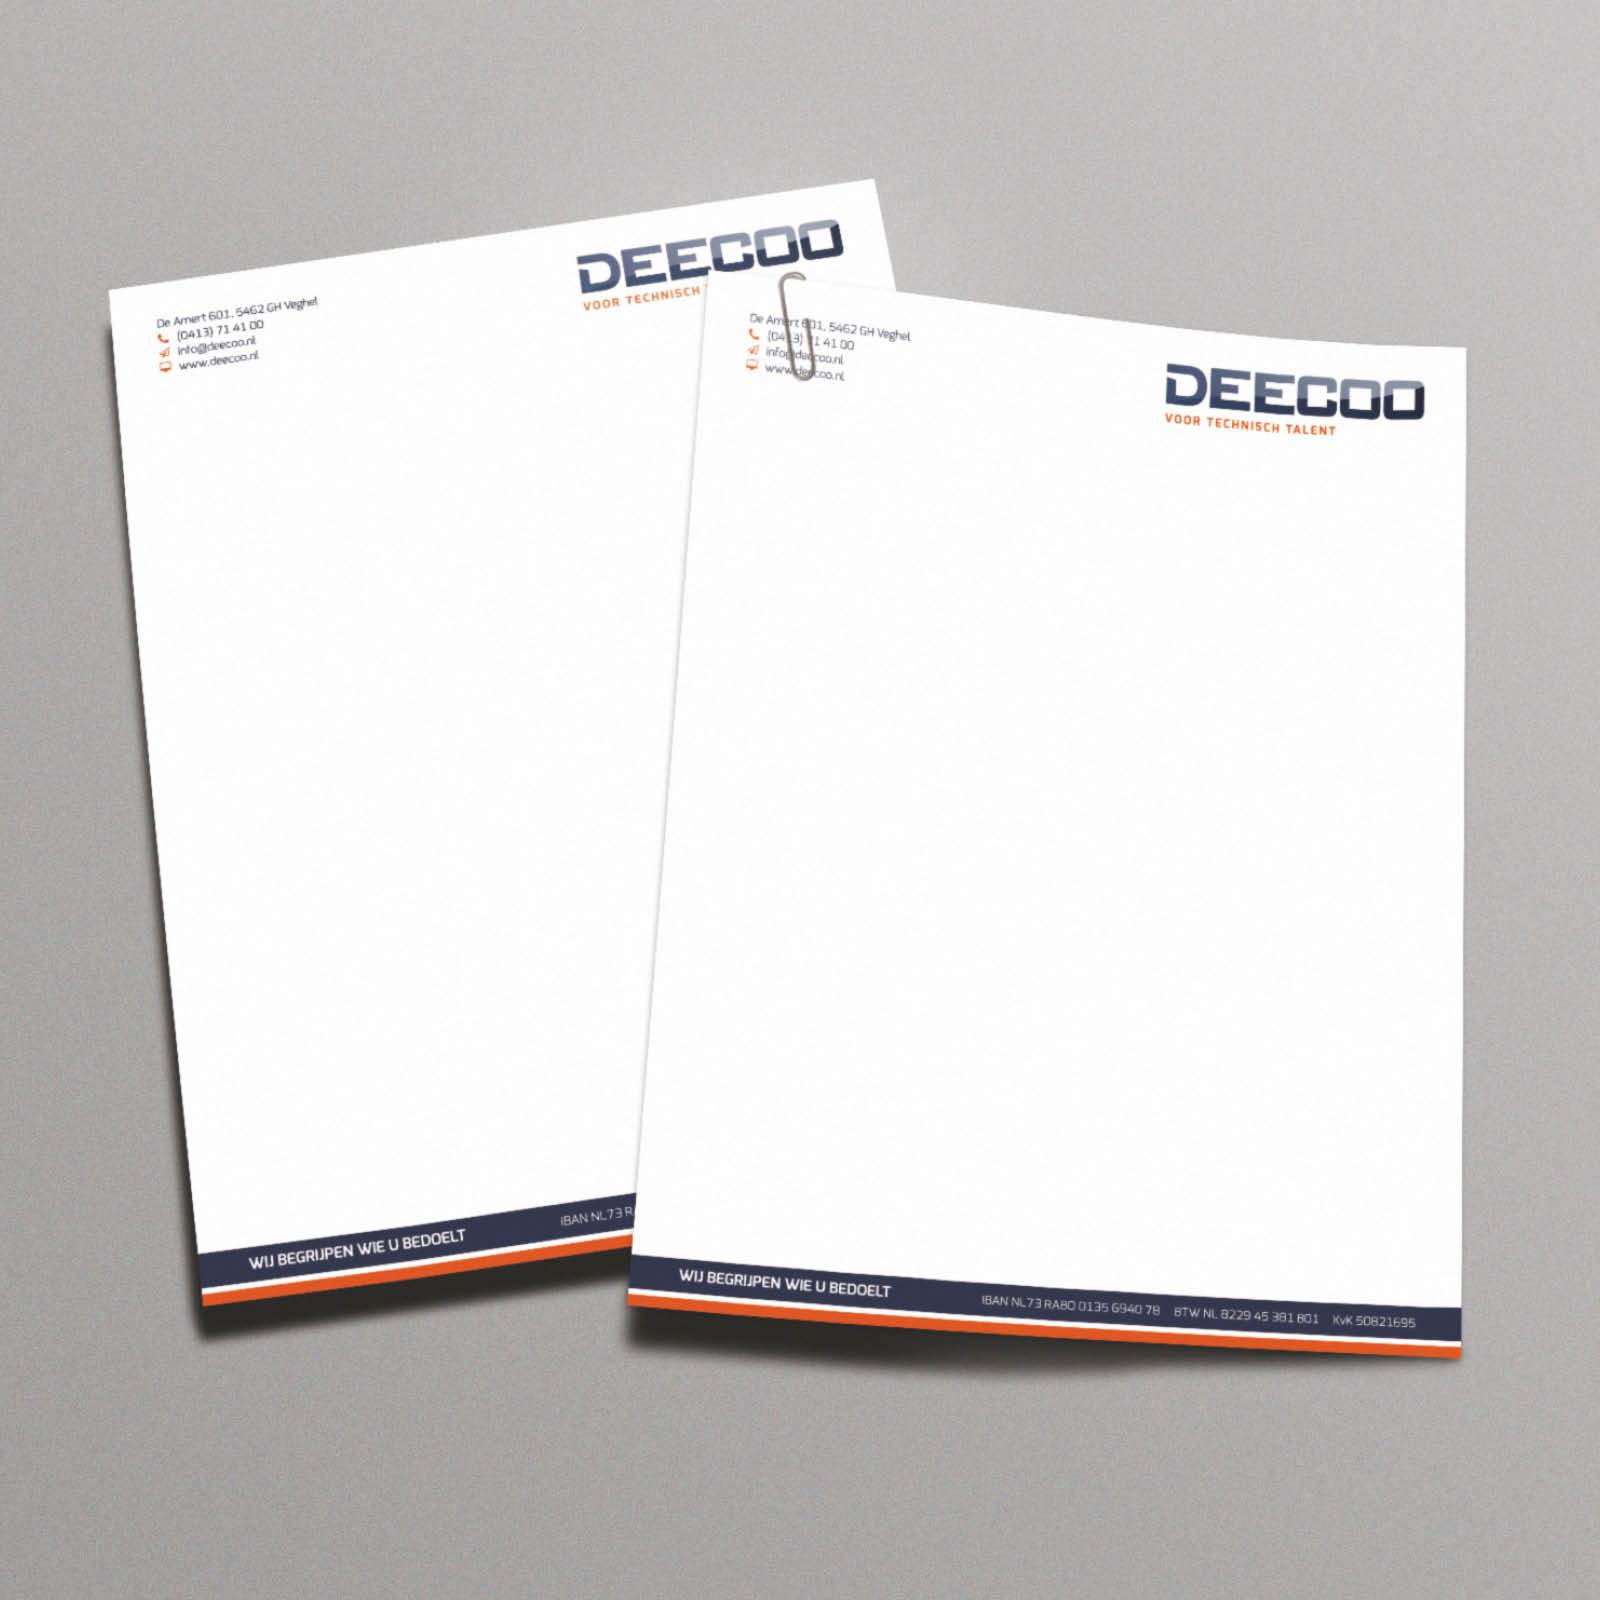 Deecoo2